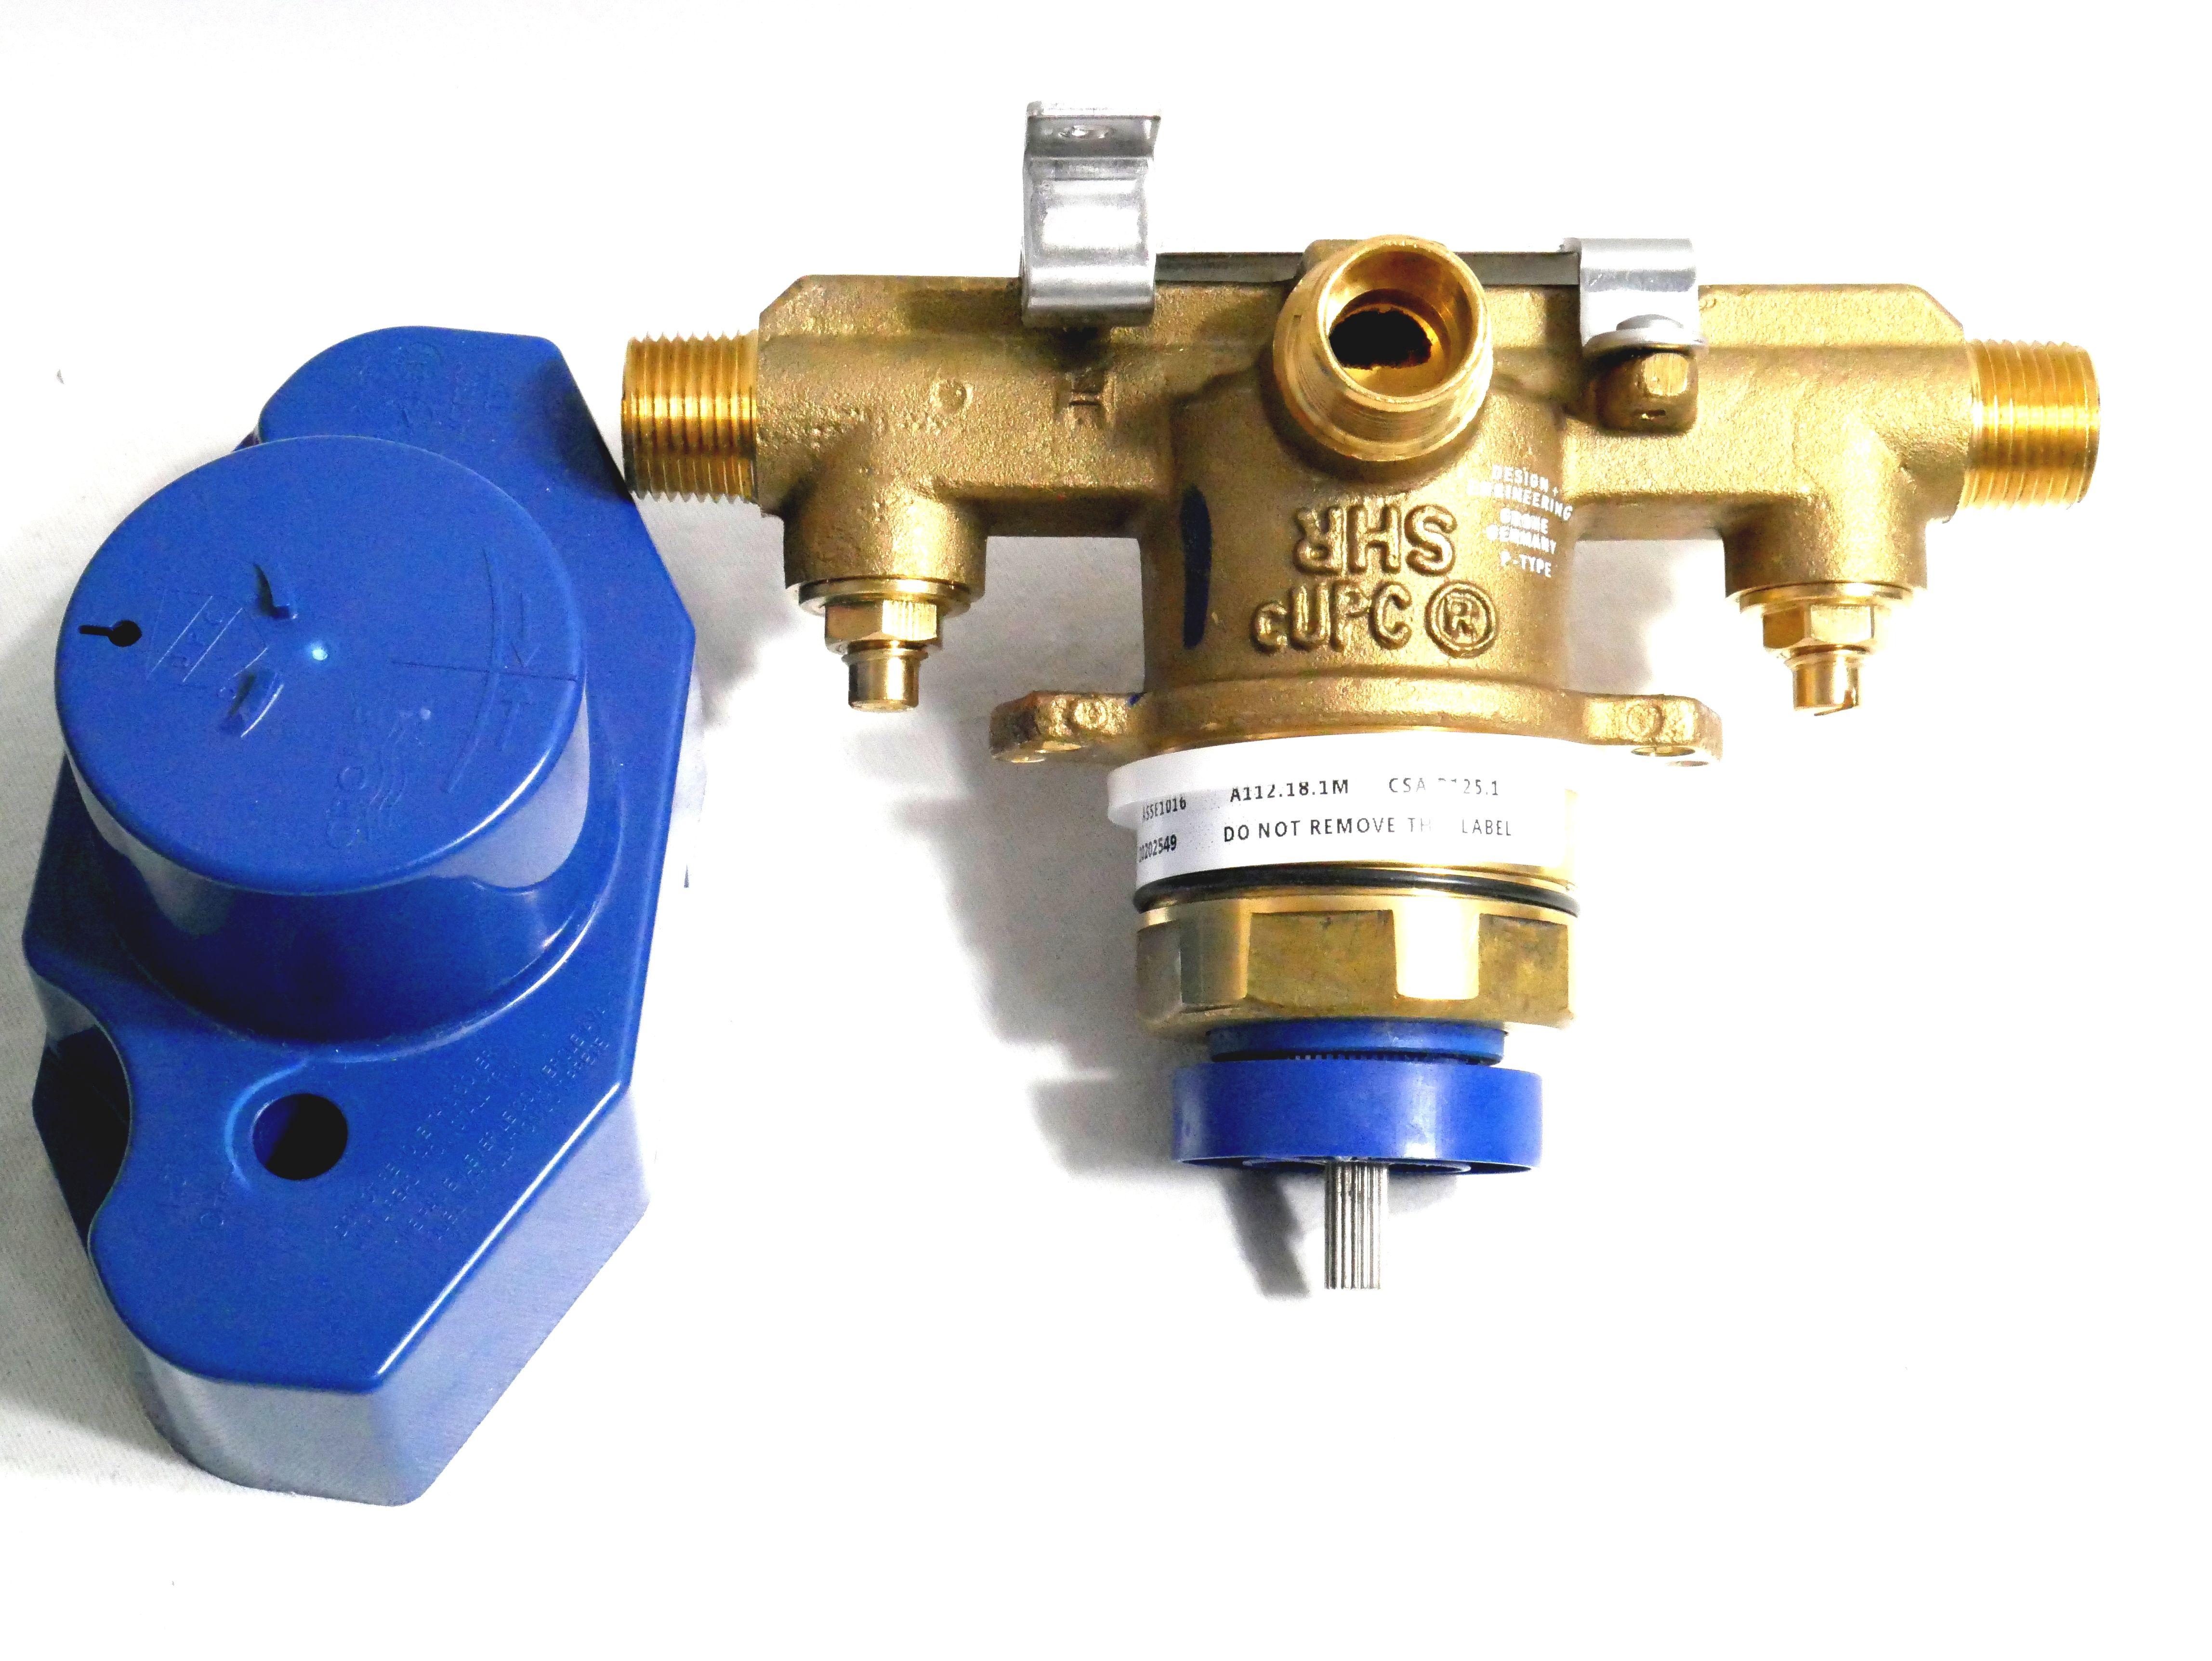 Grohe Grohsafe Universal Pressure Balance Roughinvalve 35015001 Kitchen Faucet Faucet Kohler